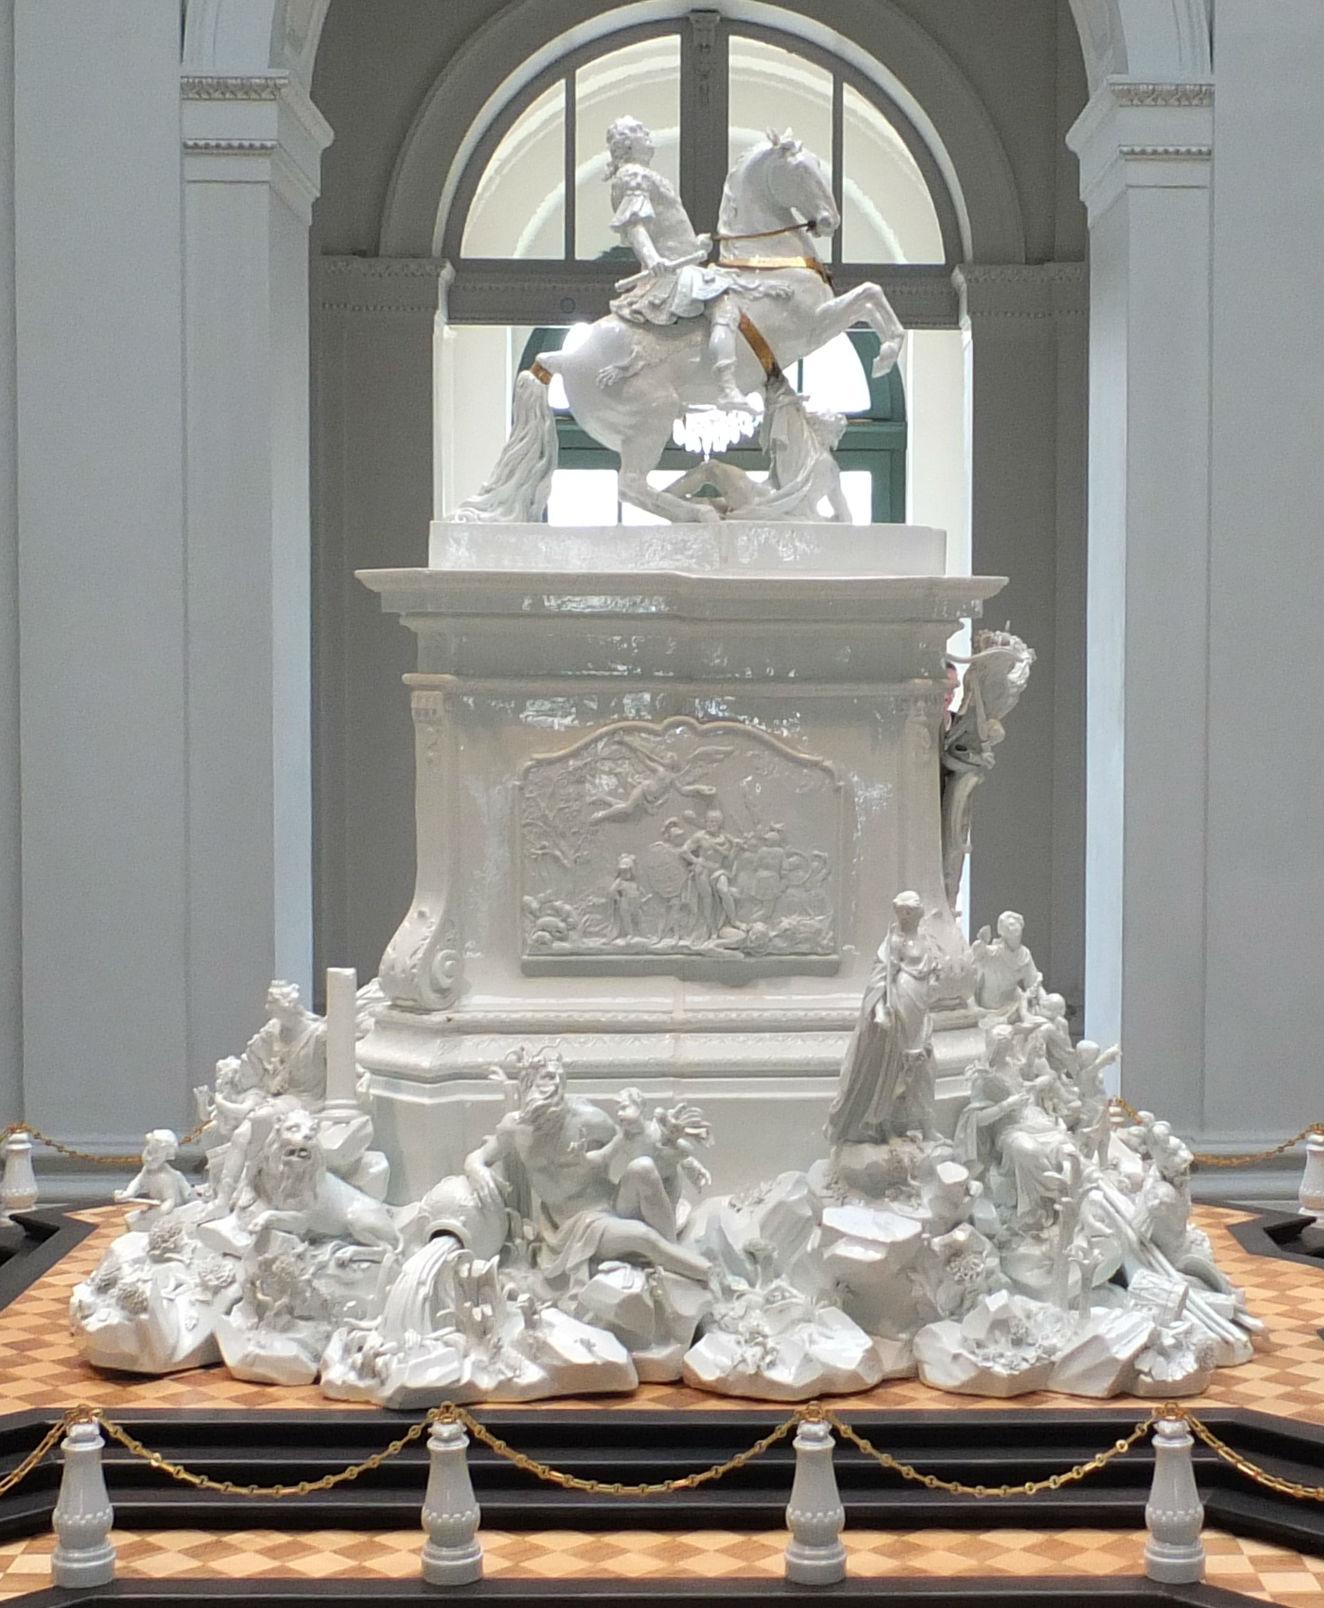 Model for a 12m equestrian statue to Augustus III, 123cm x 94cm x 117cm,1753, Johann Joachim Kändler